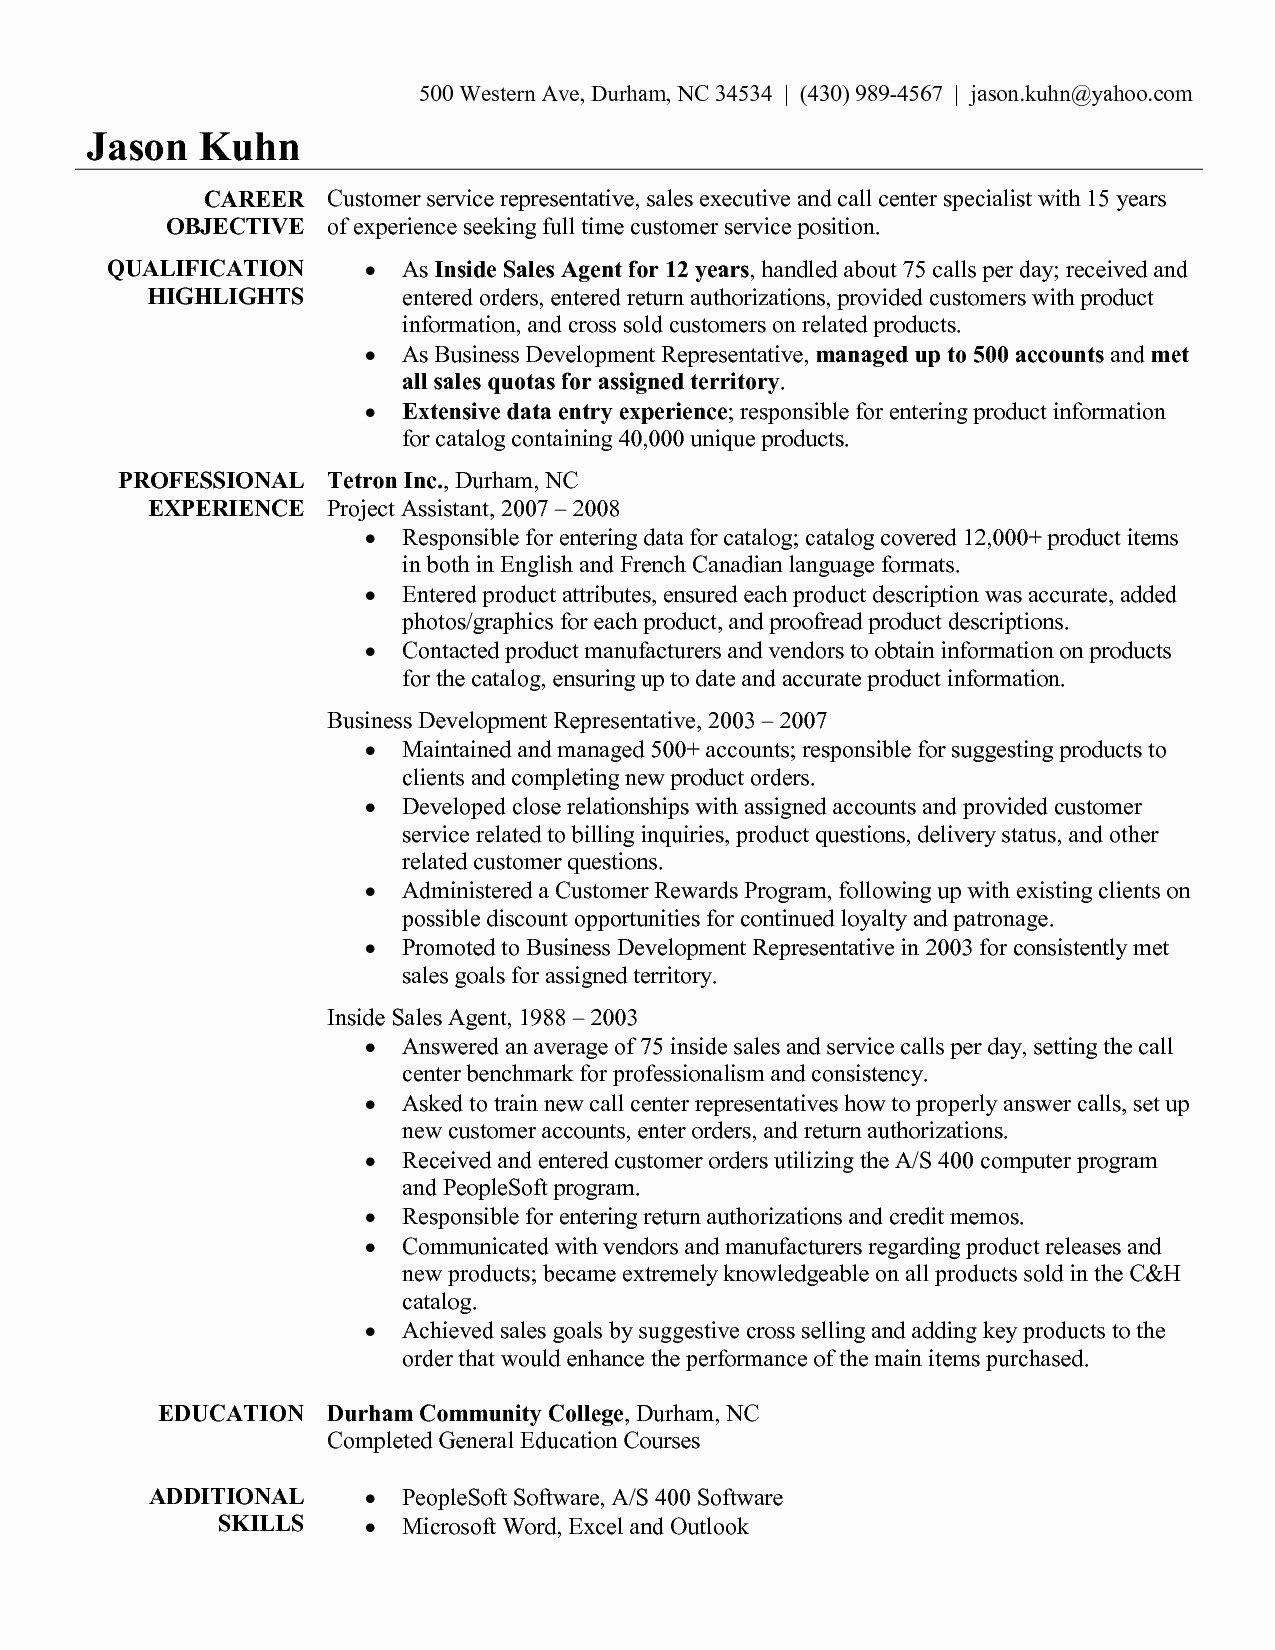 Patient Service Representative Resume Template